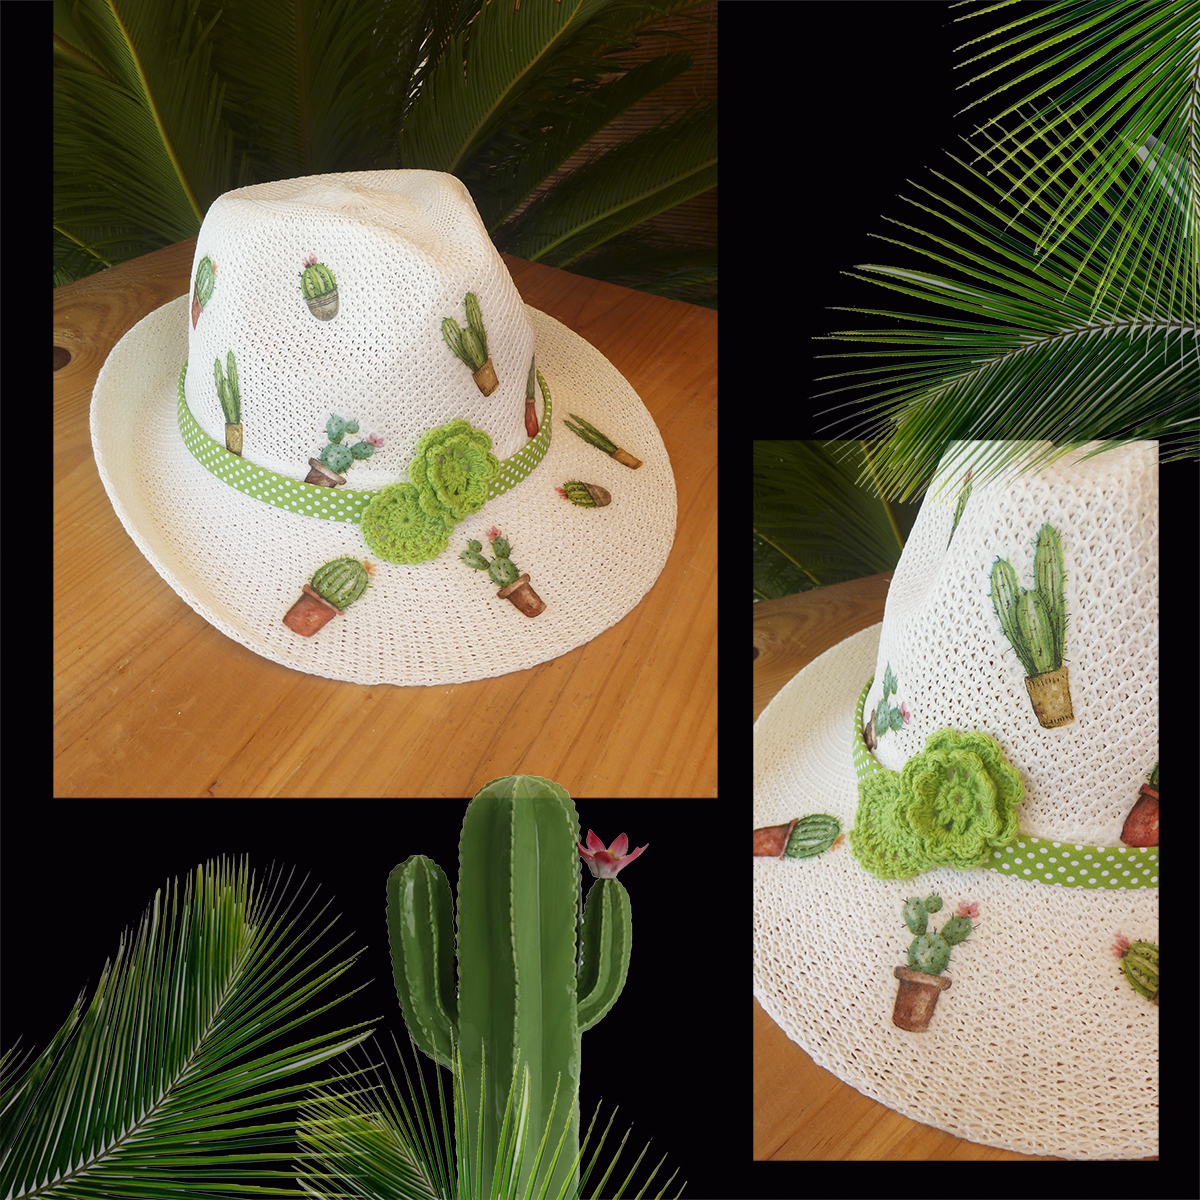 ref: cactus2 Preu: 18 eur